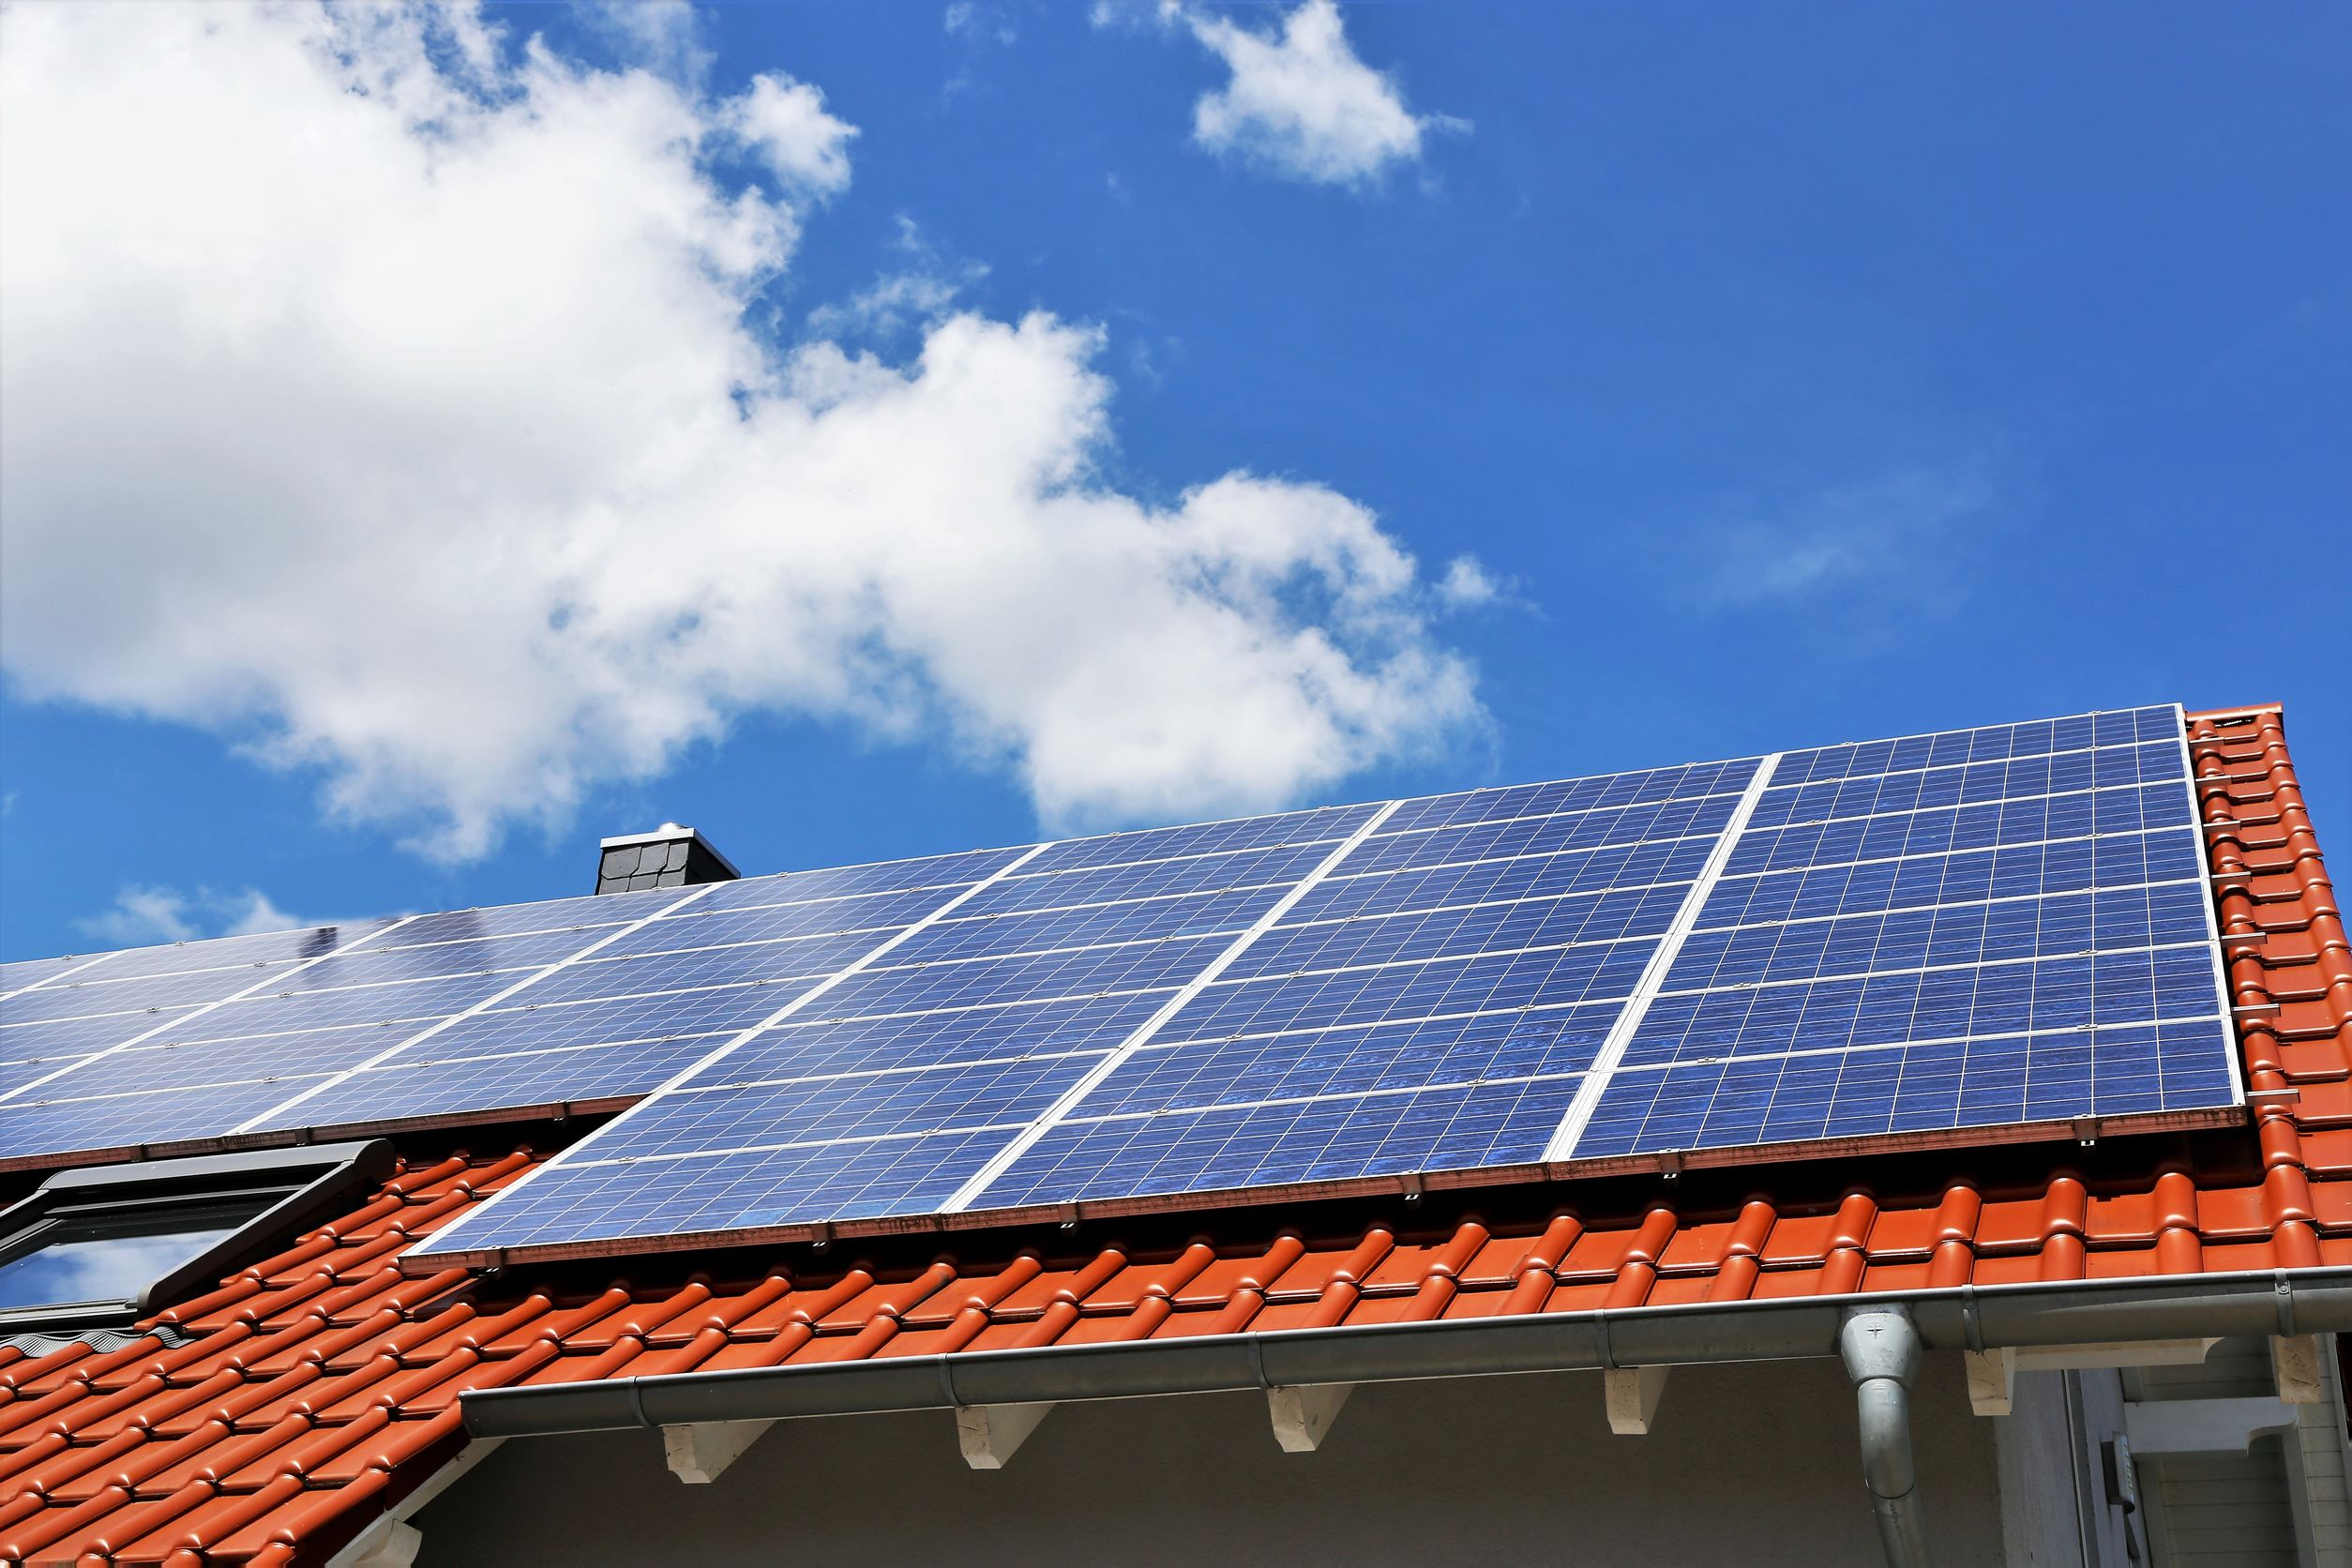 Installation panneaux photovoltaïques Anneyron Drôme